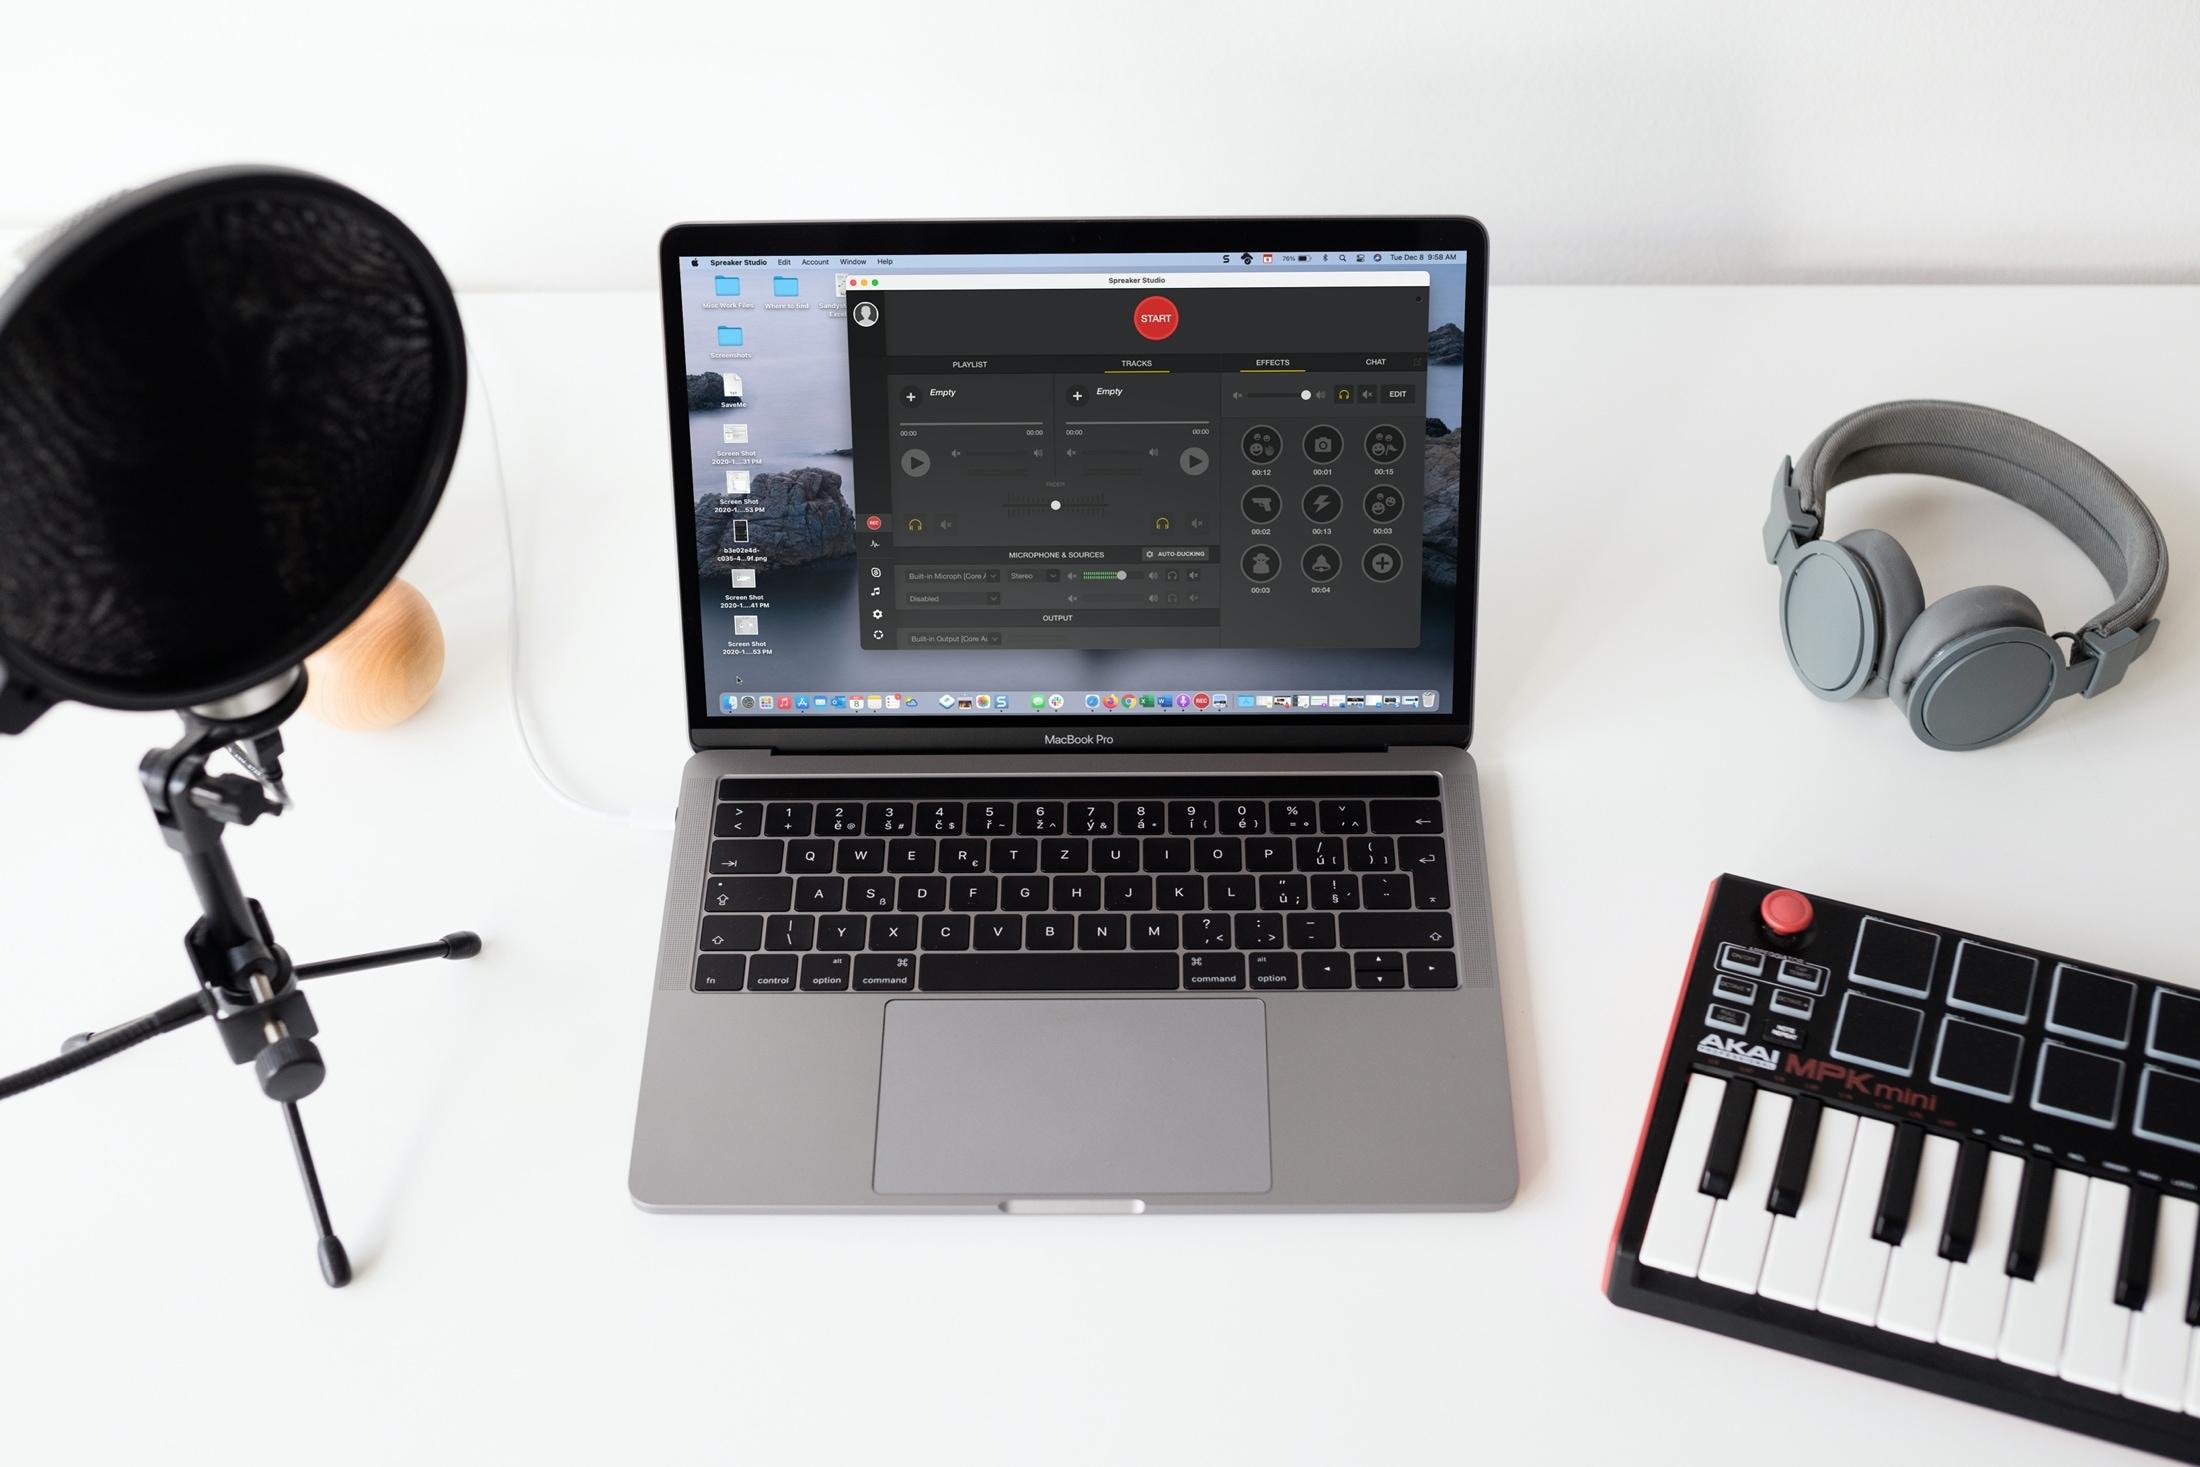 Podcast creator apps for Mac - Spreaker Studio